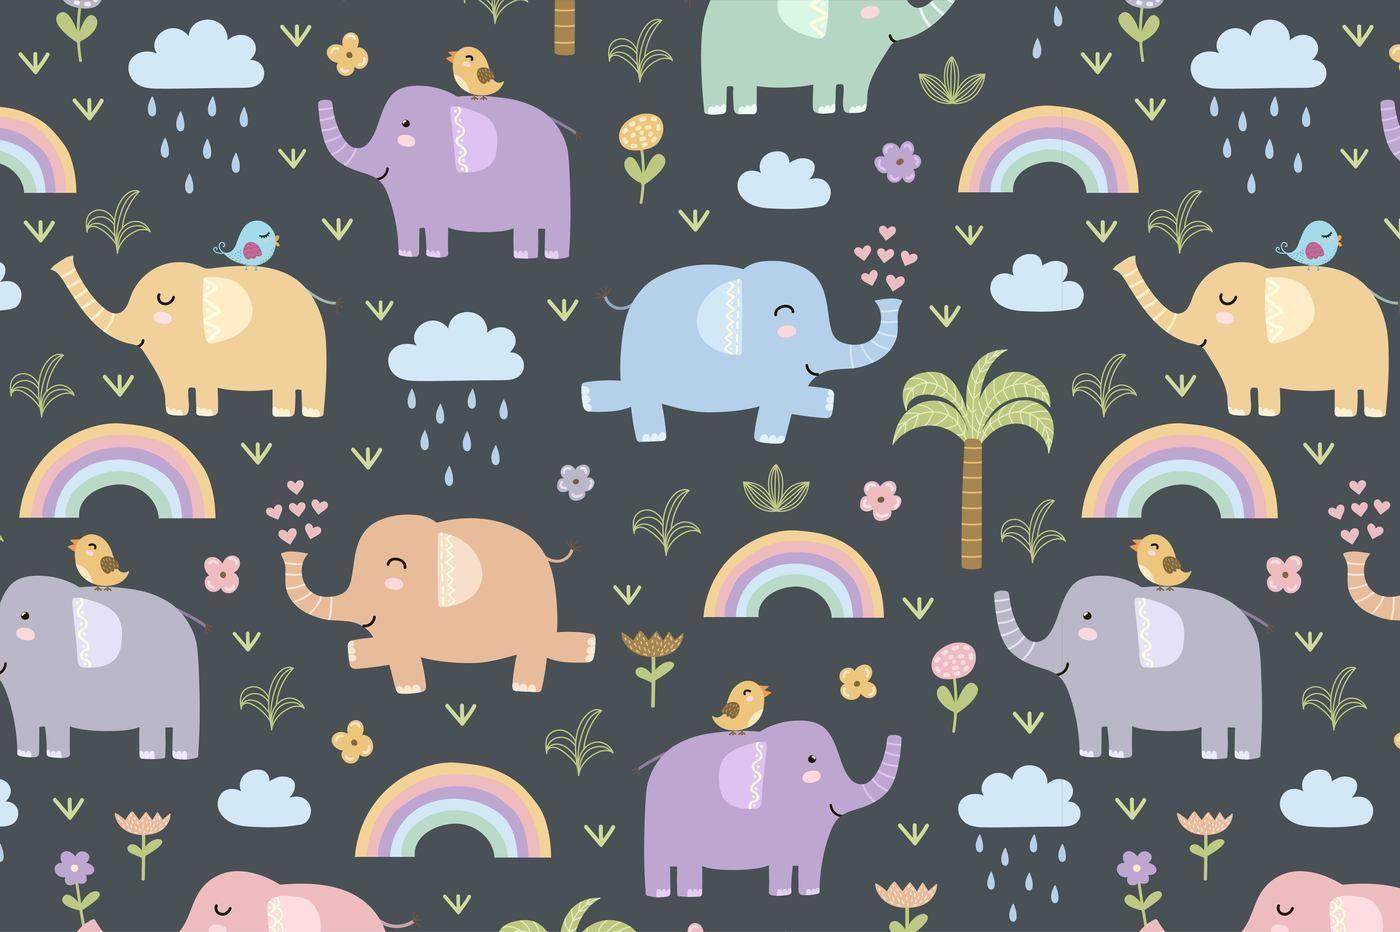 Elephants Seamless Patterns Clipart By Juliyas Art